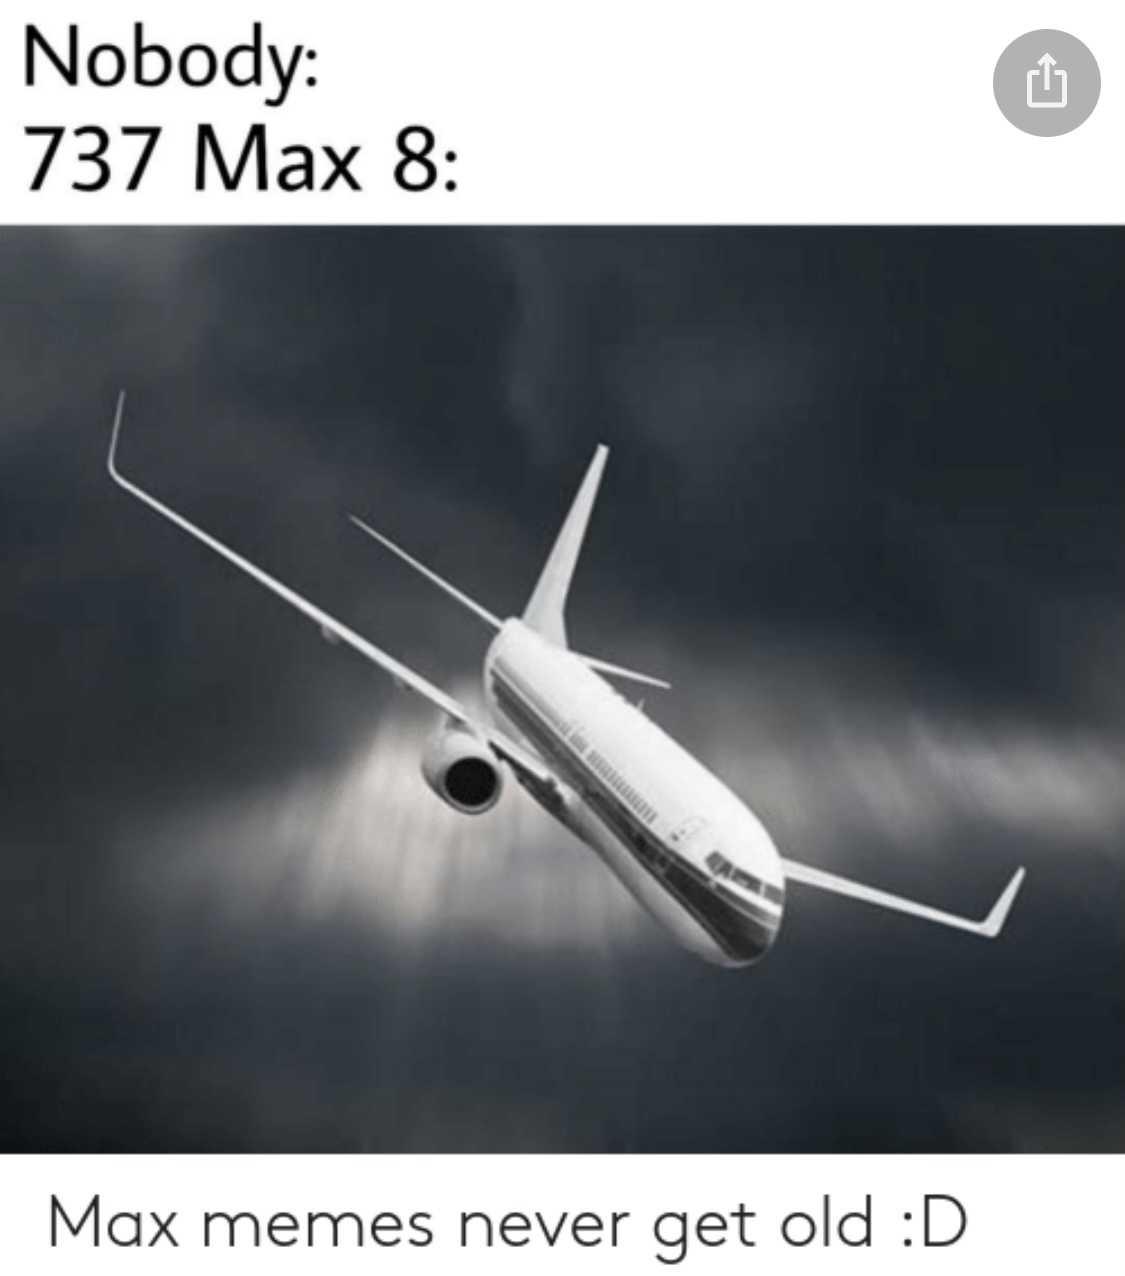 funny 737 max memes - max memes